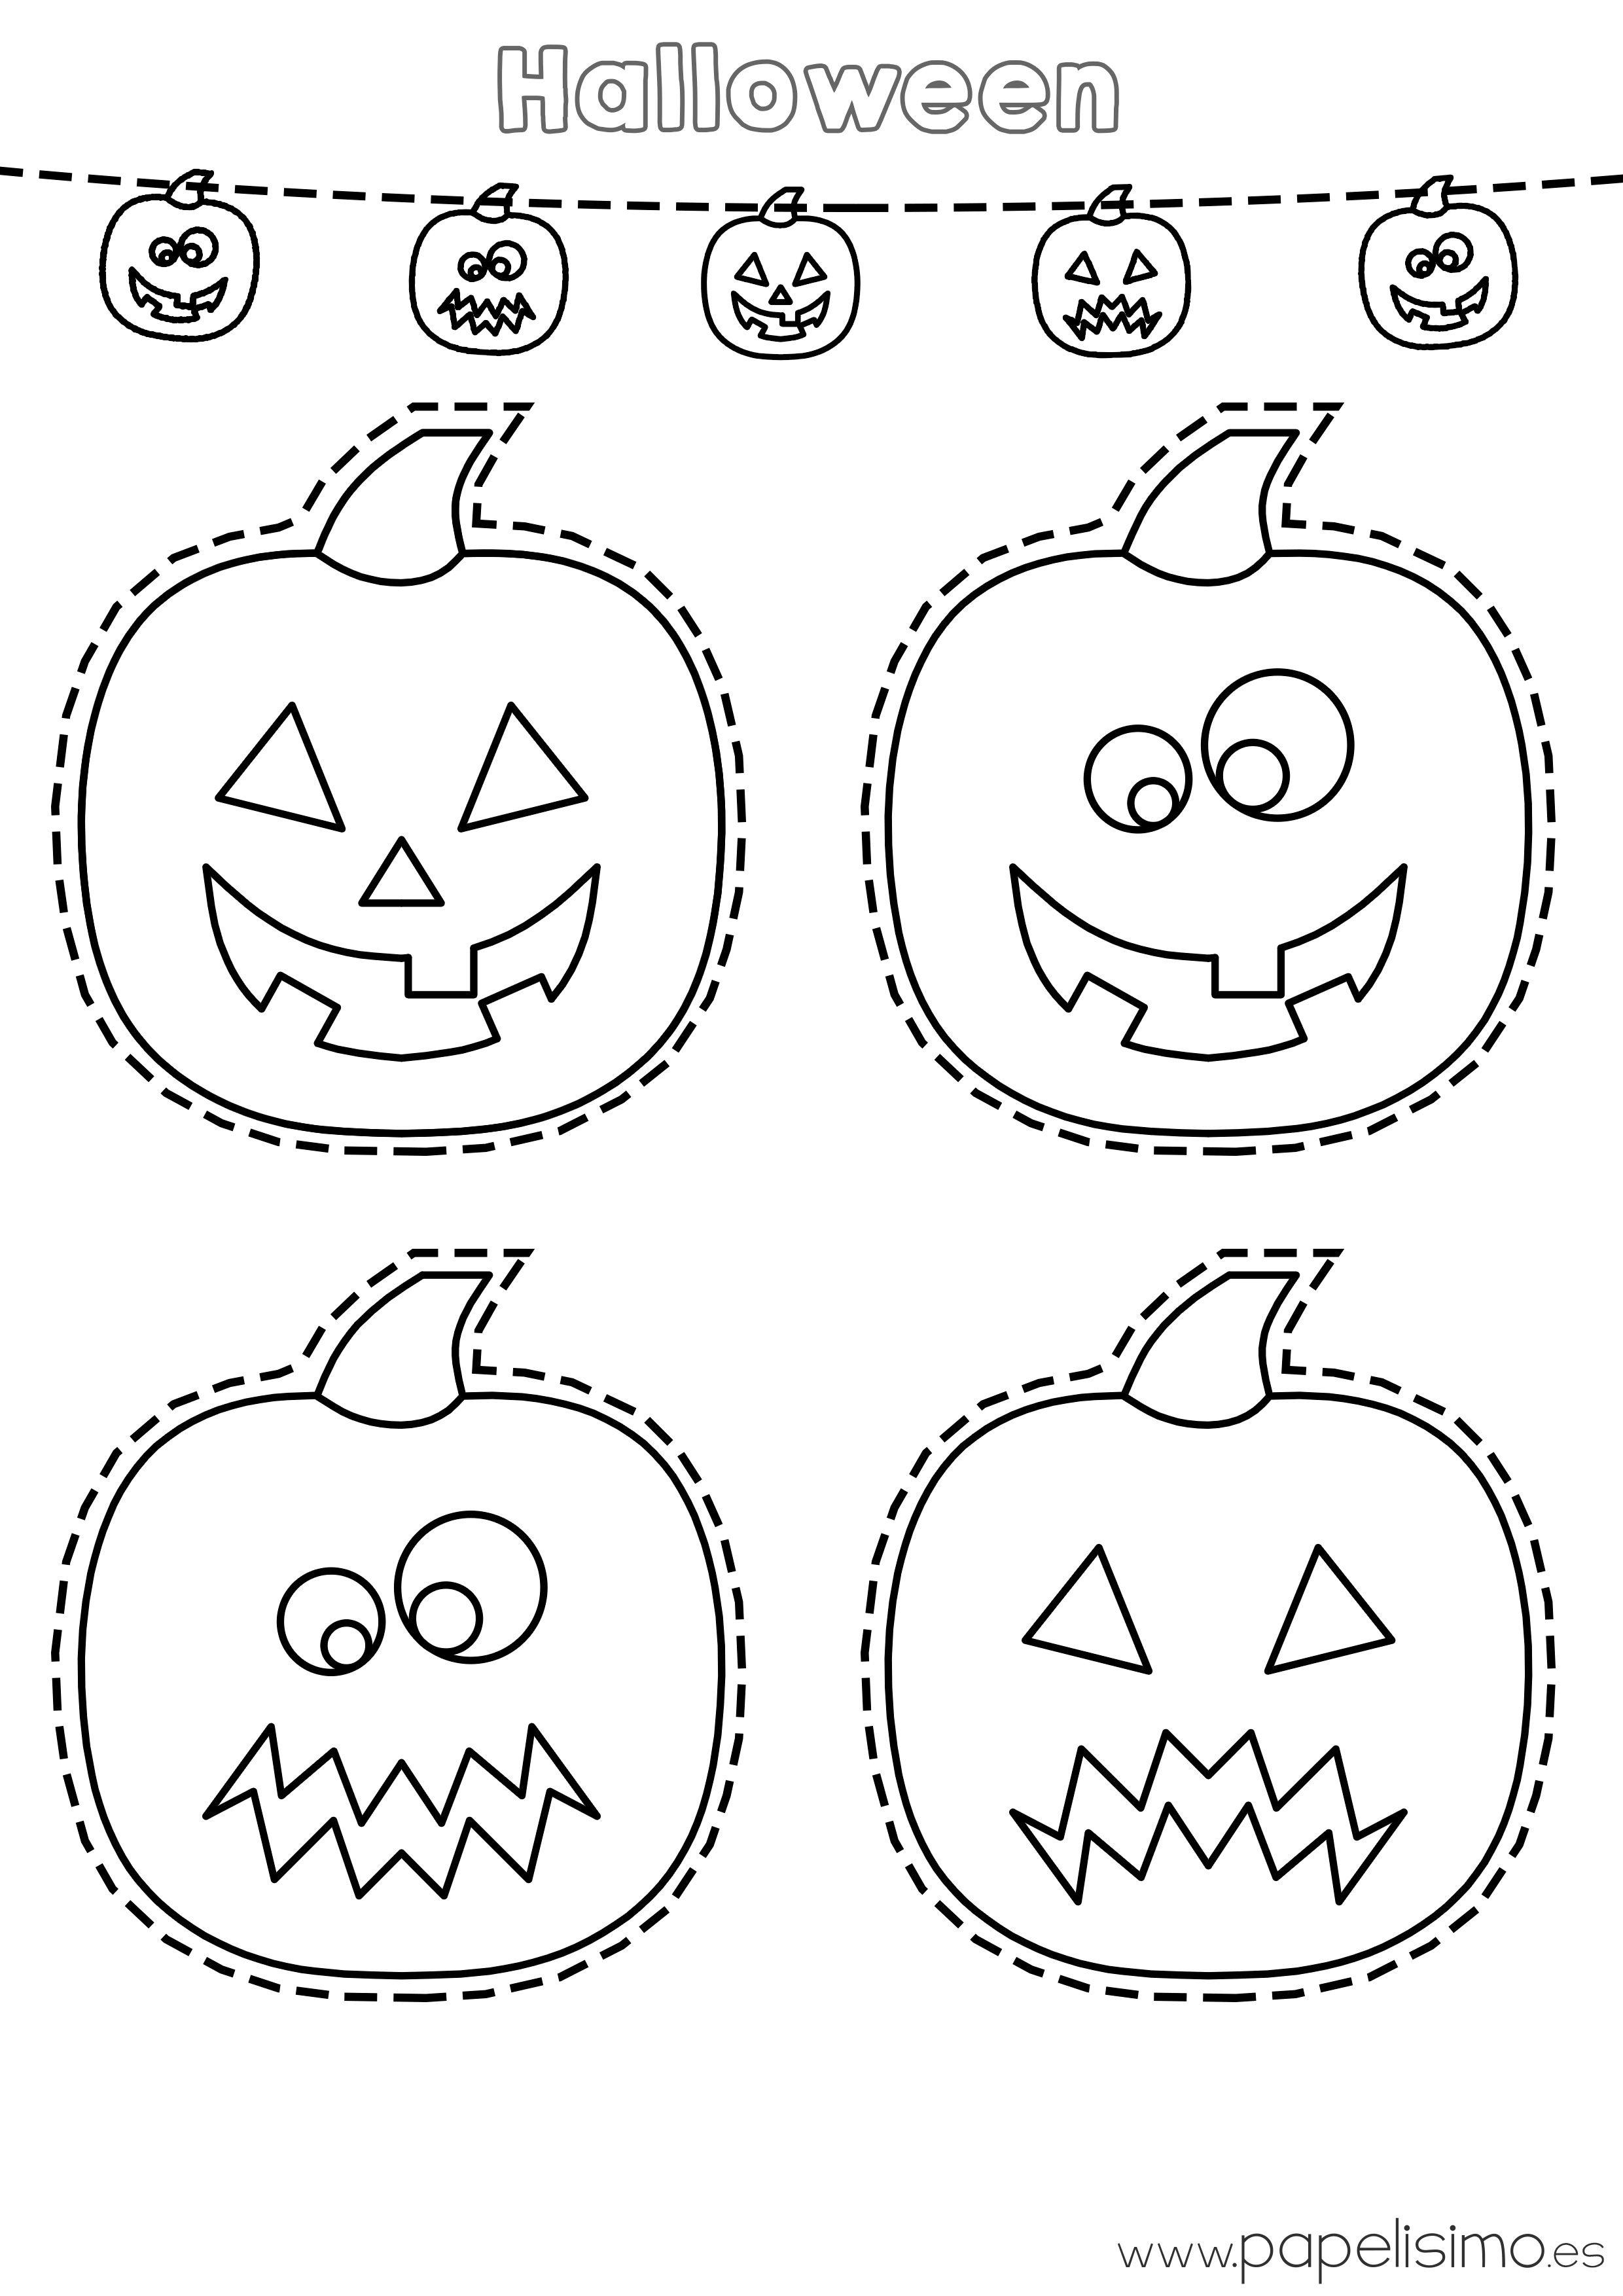 Calabazas Halloween Para Colorear Gratis | Cartoonsite.co